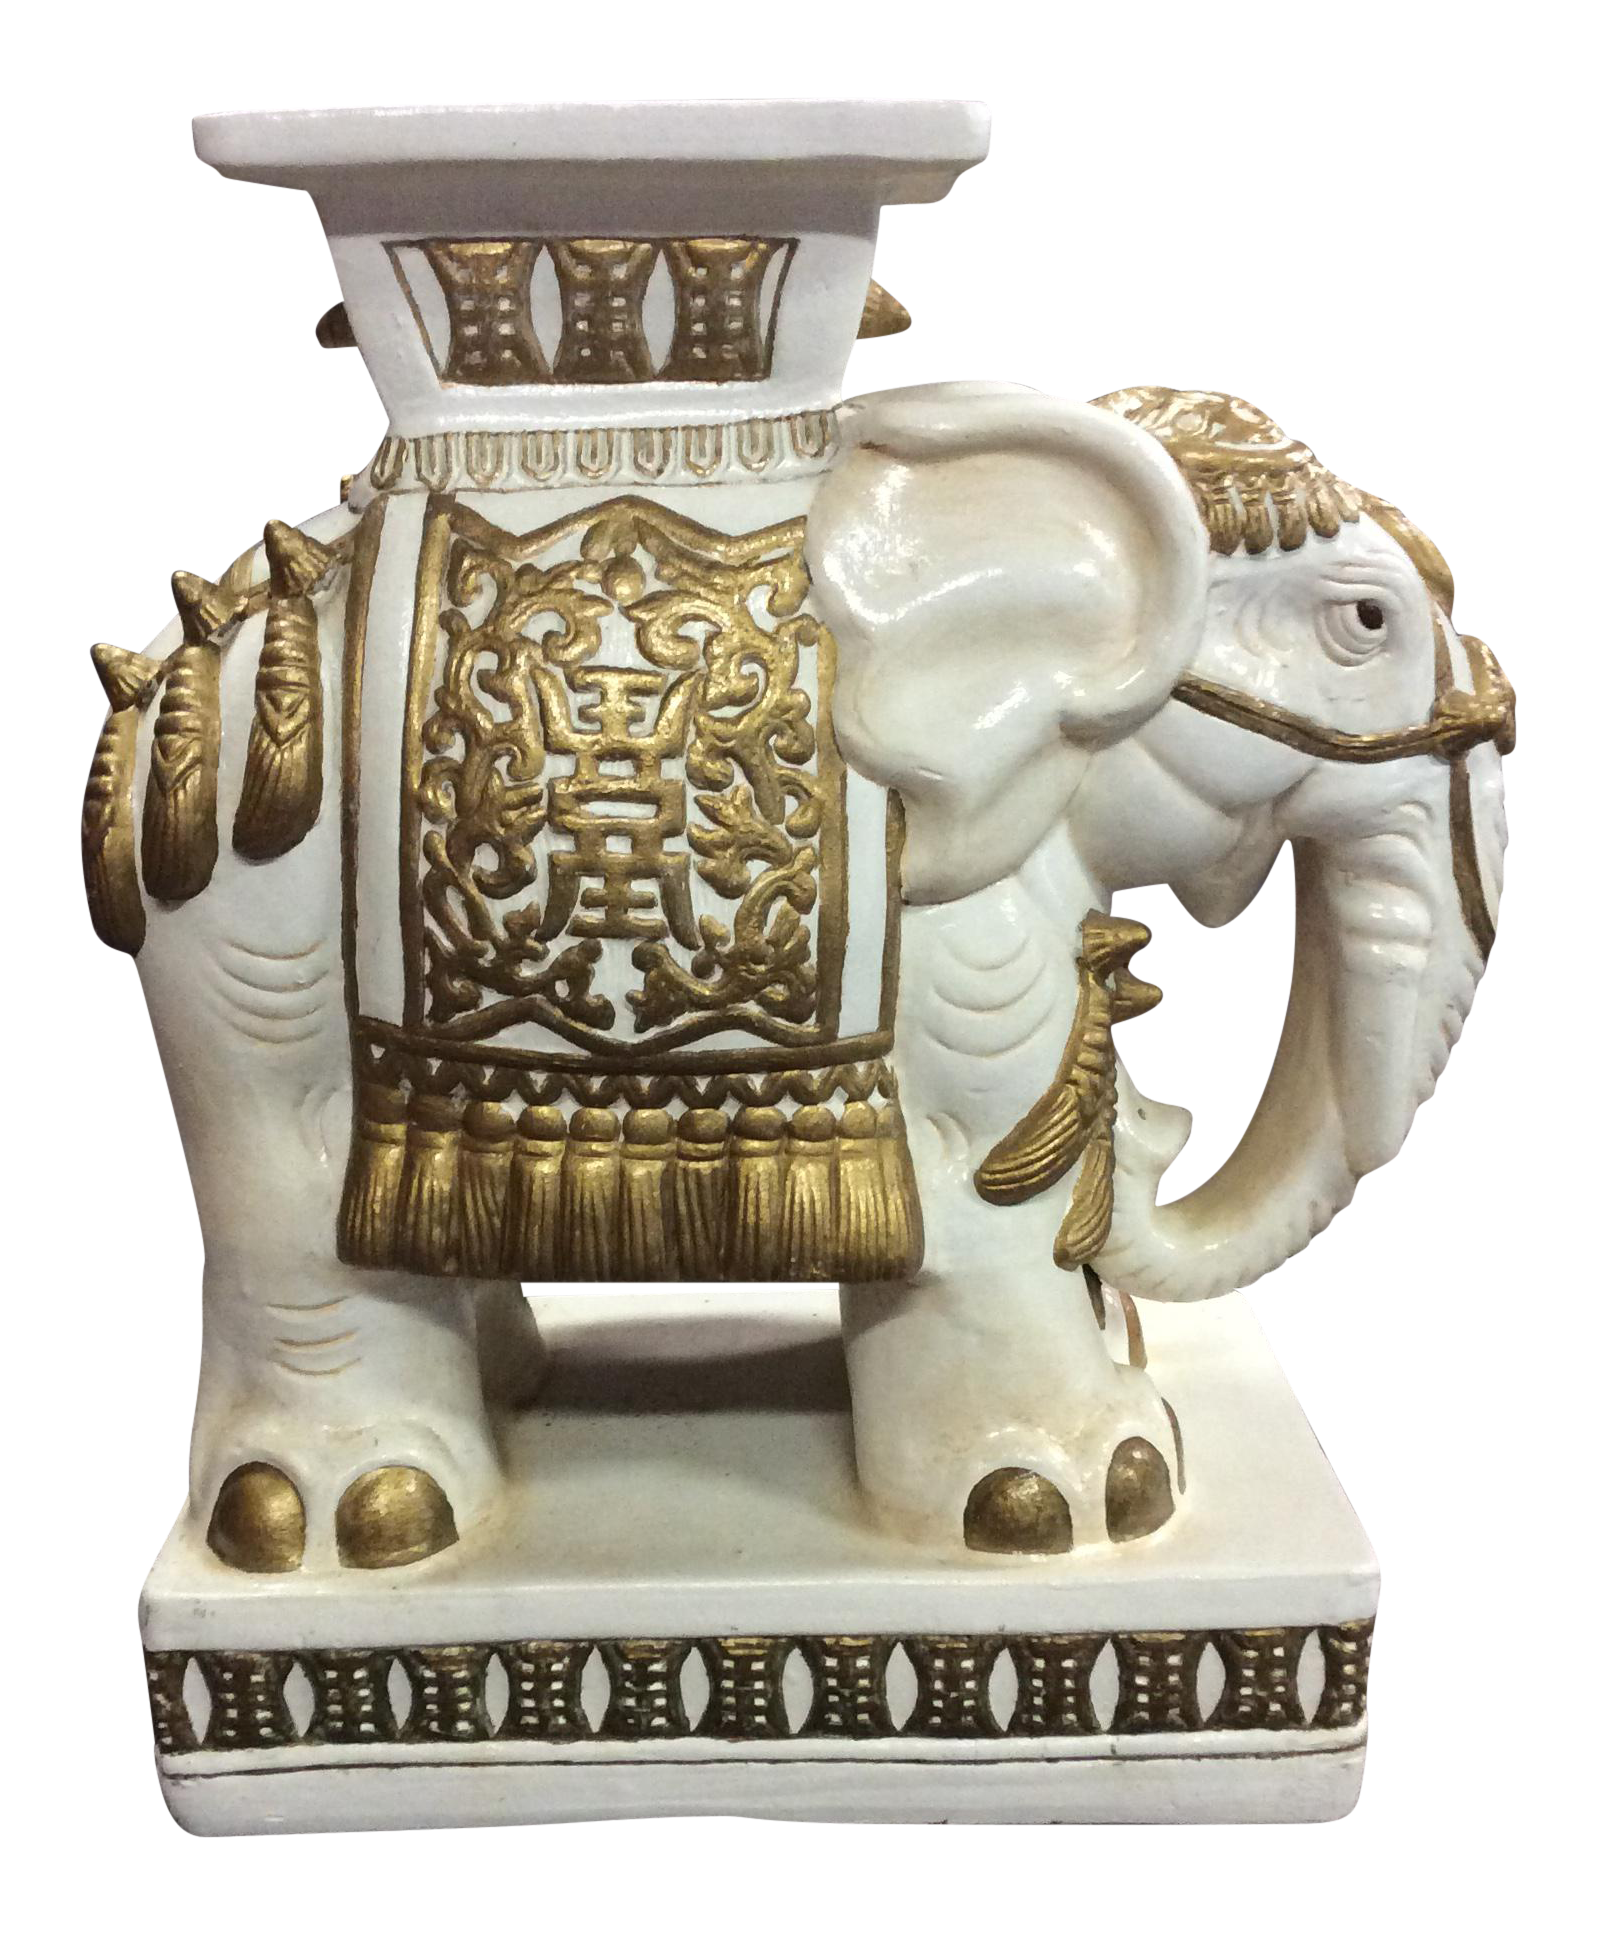 Ceramic Elephant Garden Stool  sc 1 st  Chairish & Vintage \u0026 Used Garden Stools | Chairish islam-shia.org